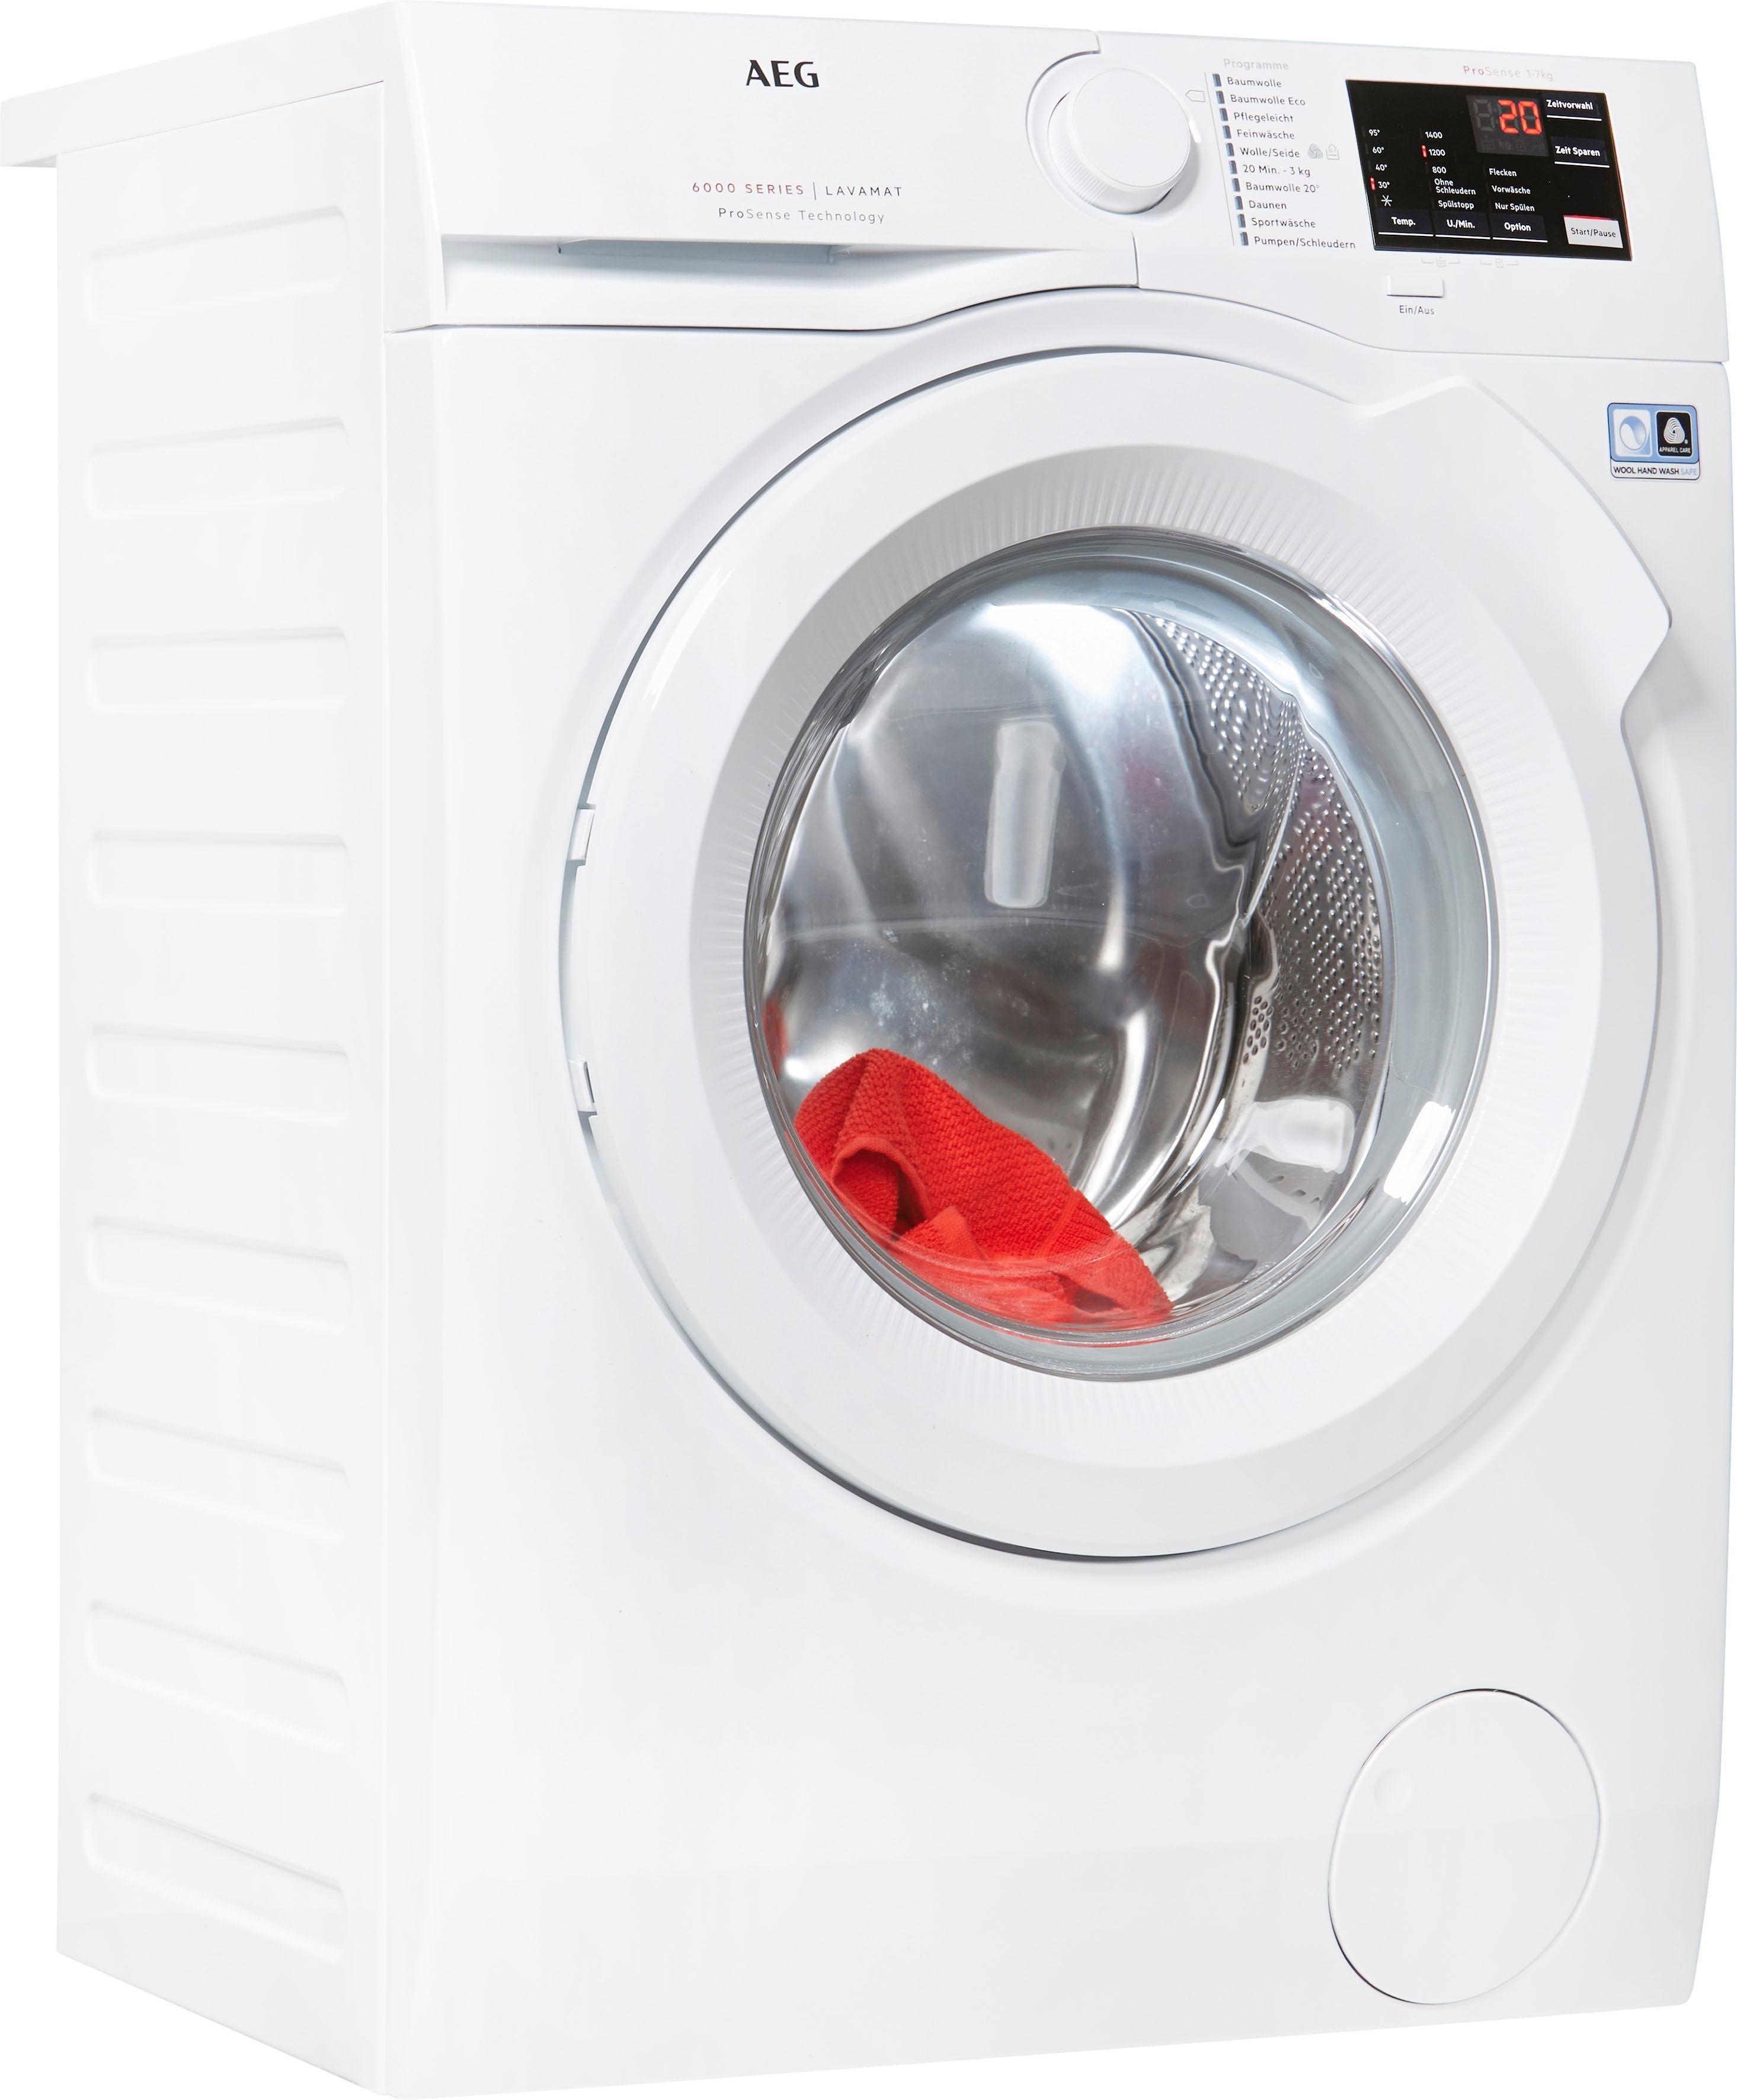 AEG Waschmaschine L6FB50472, 7 kg, 1400 U/Min